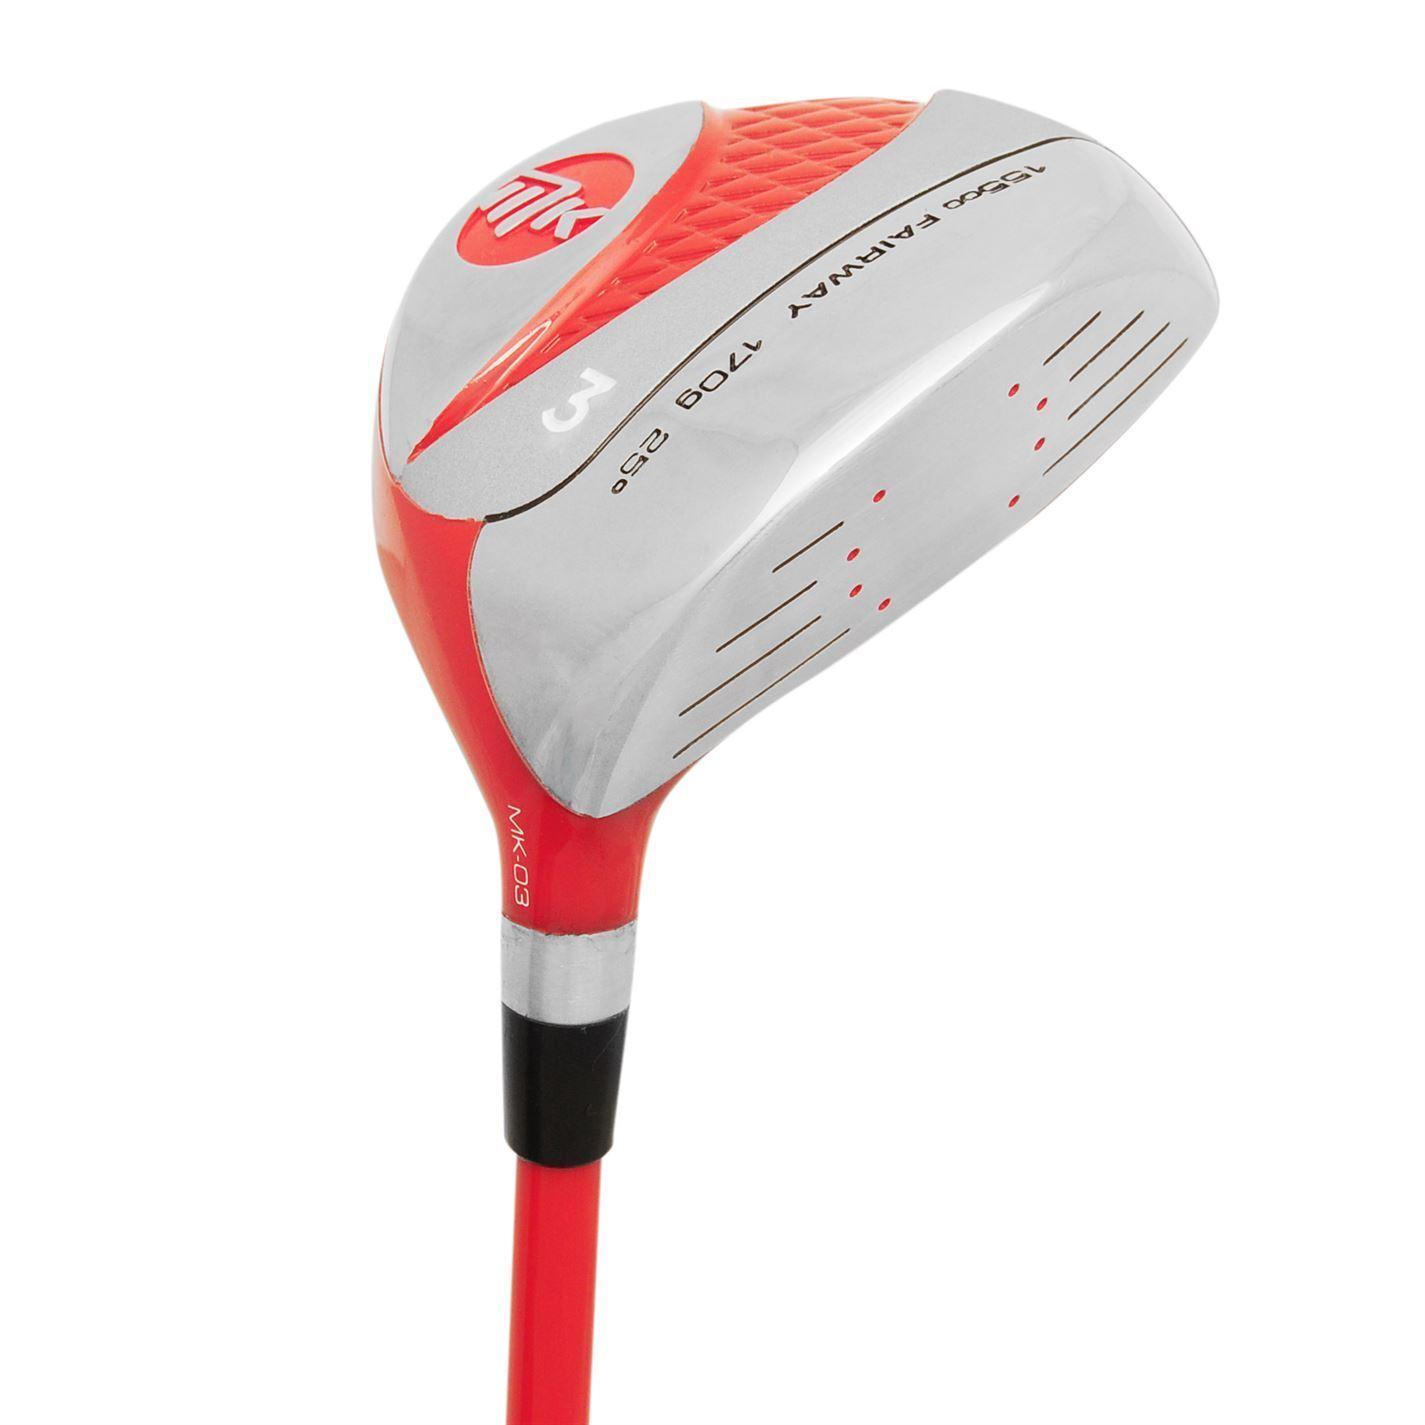 Golf-Artikel NIKE ENGAGE TOE SWEEP 60 DEG LOB WEDGE KBS CTAPER REGULAR FLEX STEEL